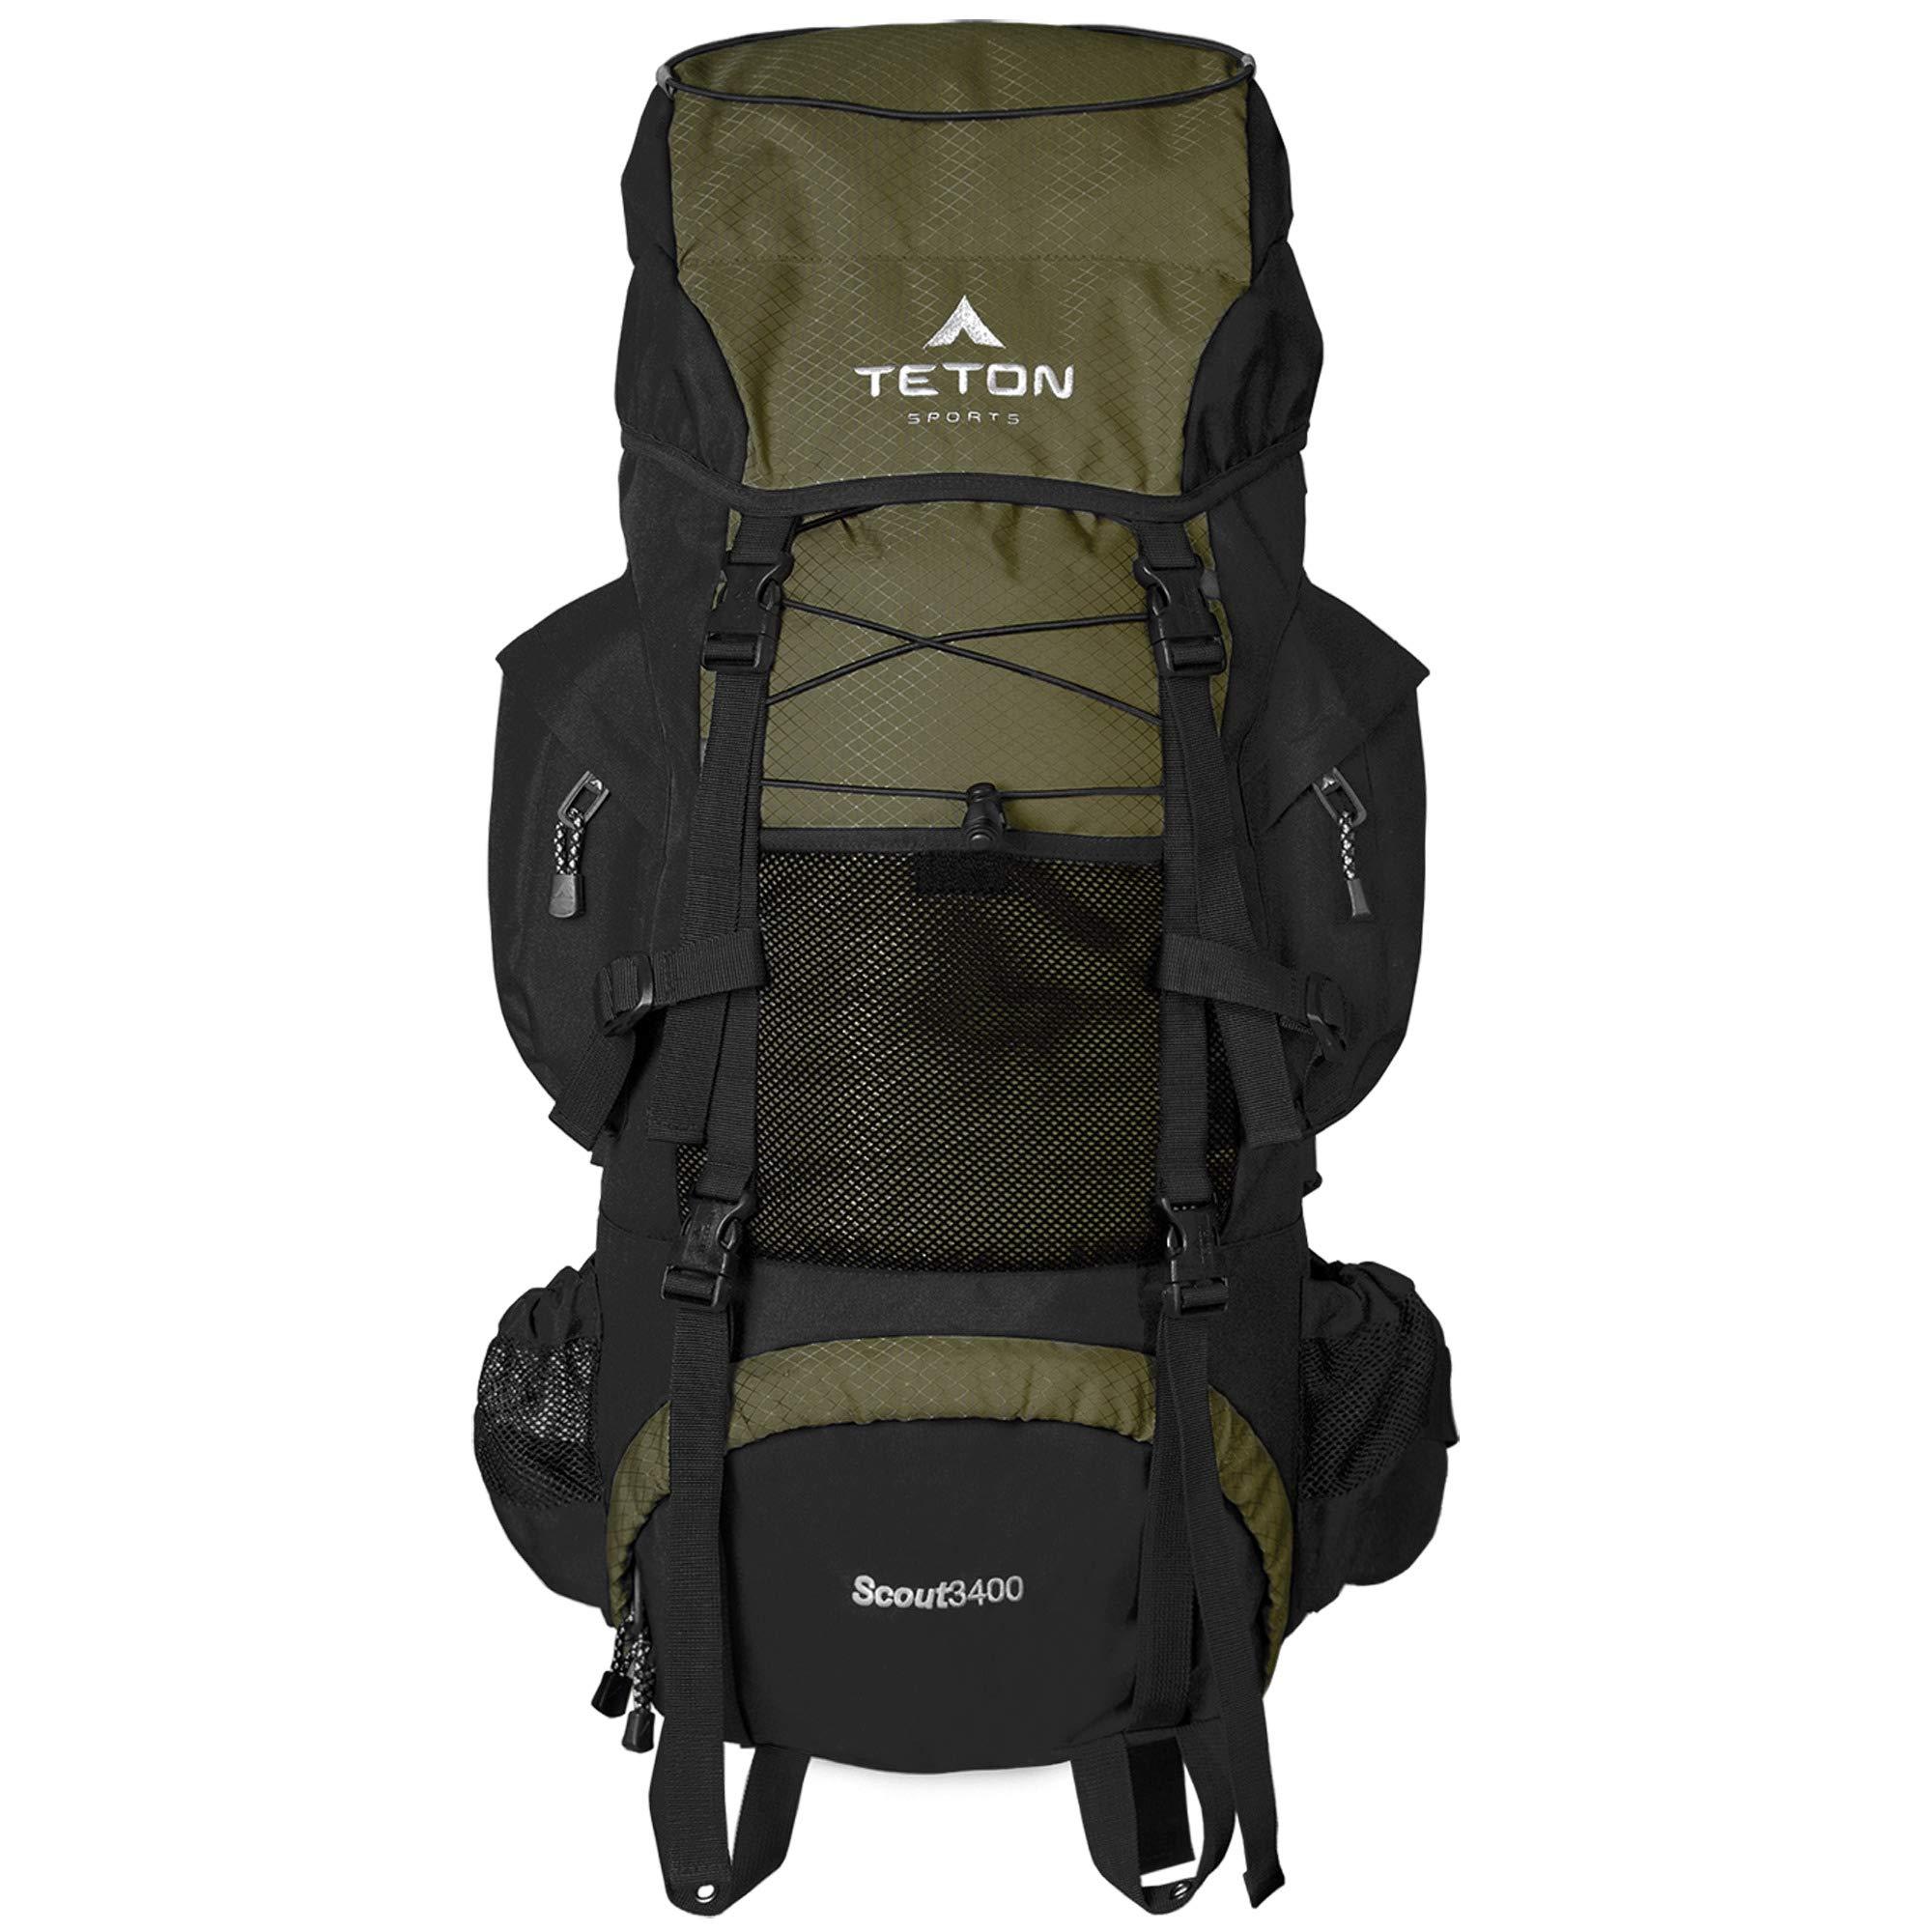 TETON Sports Internal High Performance Backpacking